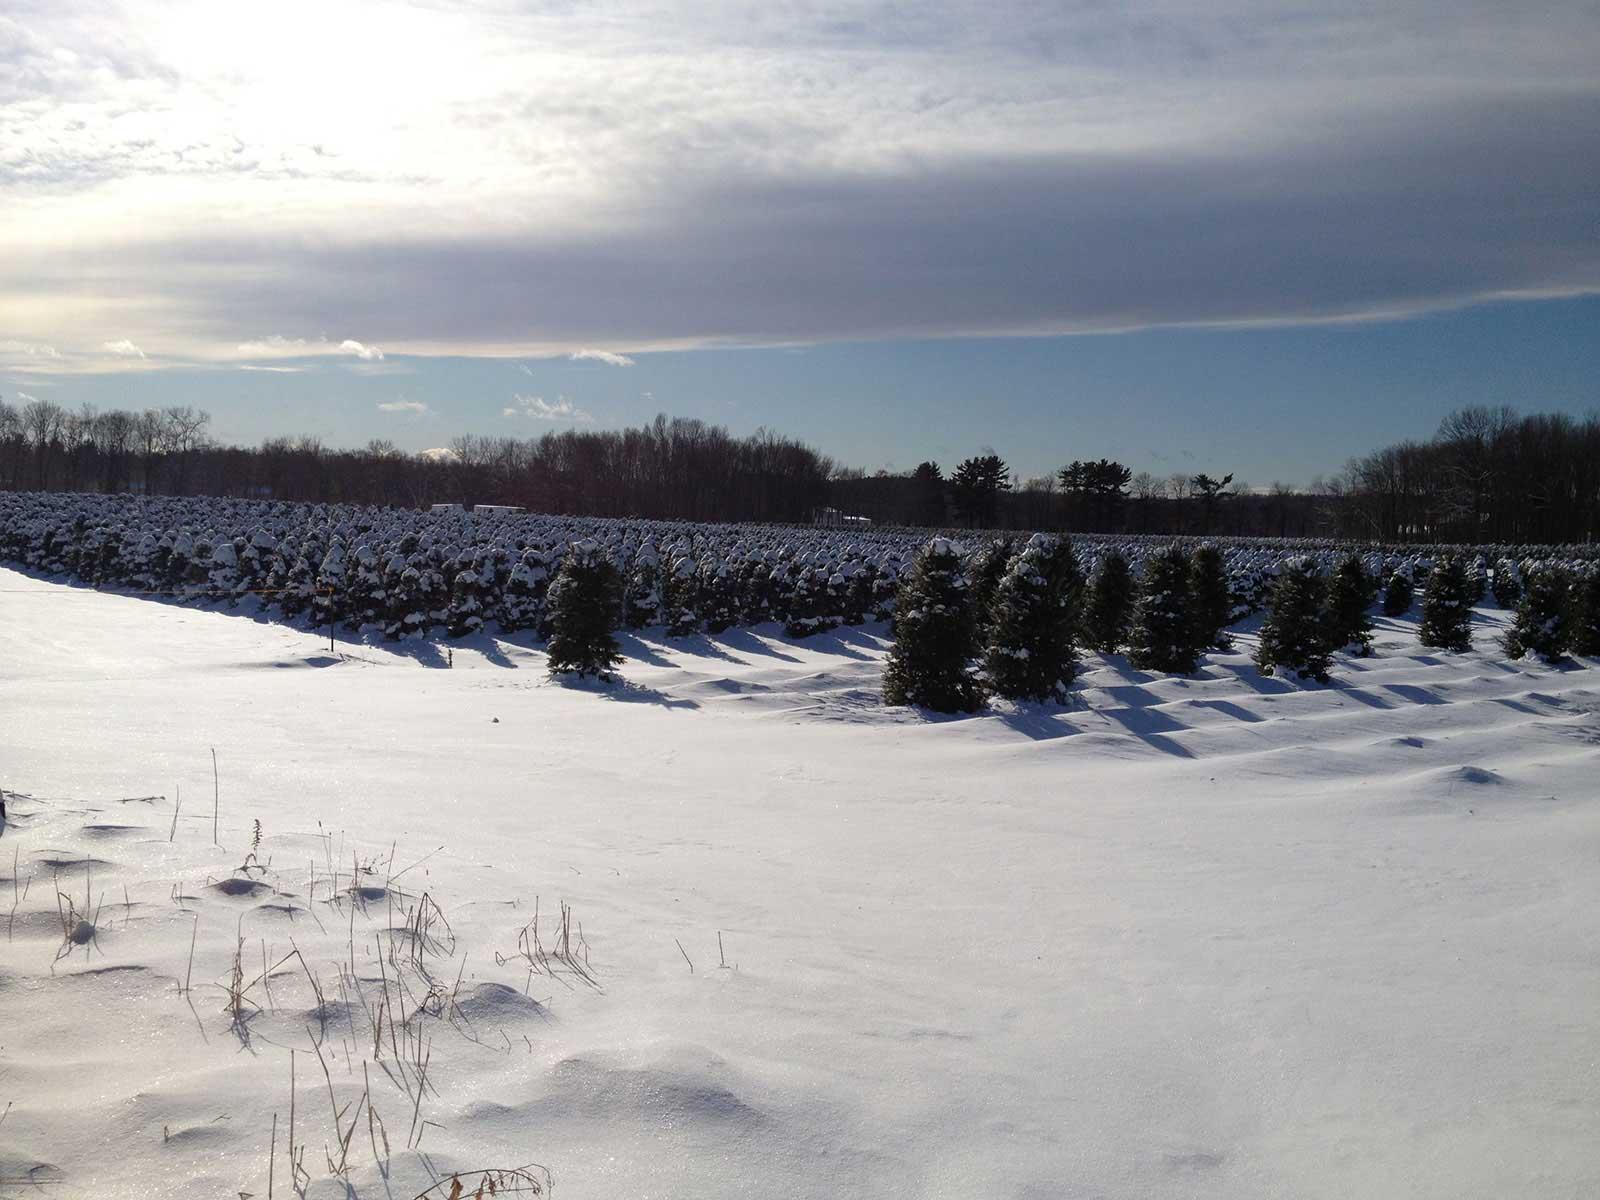 Snowed Over Christmas Trees